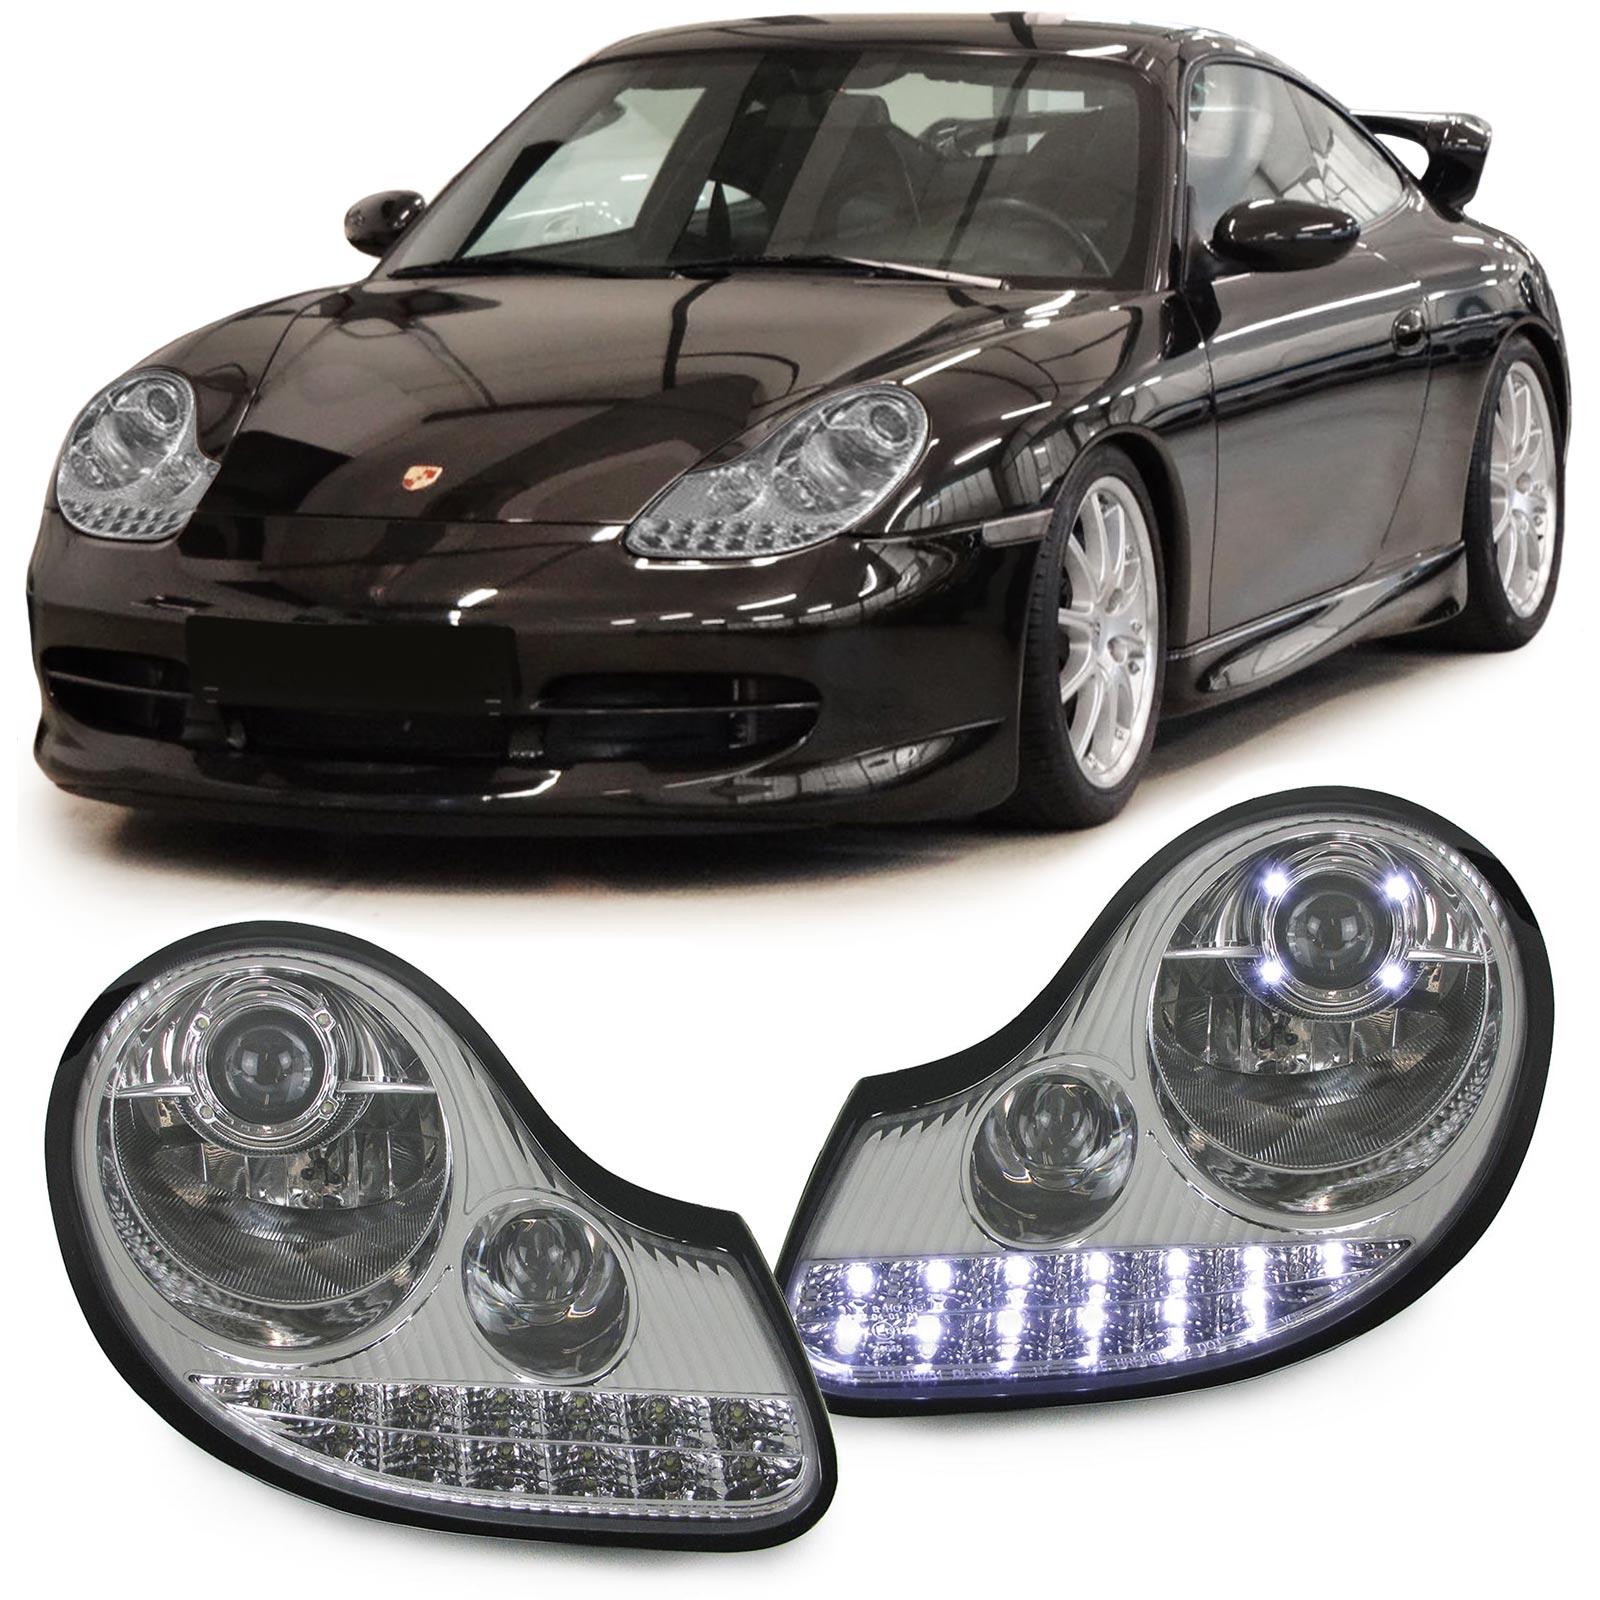 klarglas scheinwerfer chrom mit led blinker f r porsche 911 996 boxster 986 ebay. Black Bedroom Furniture Sets. Home Design Ideas